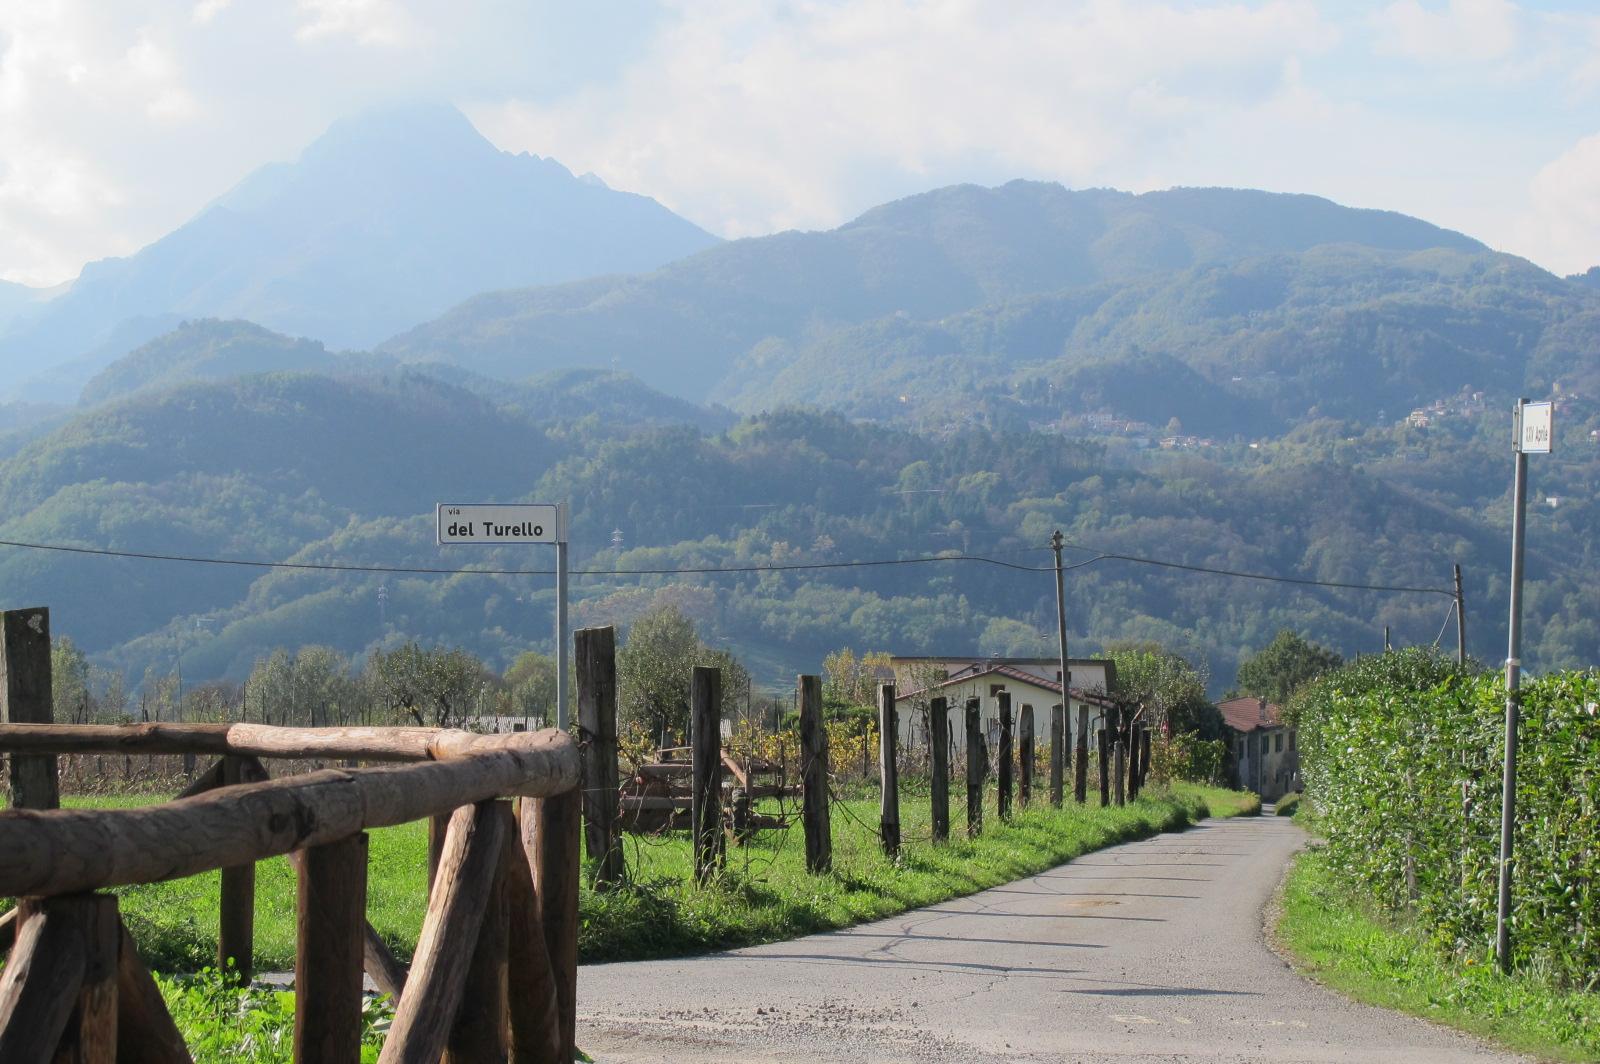 Celebratory view of La Pania Secca from Barga.